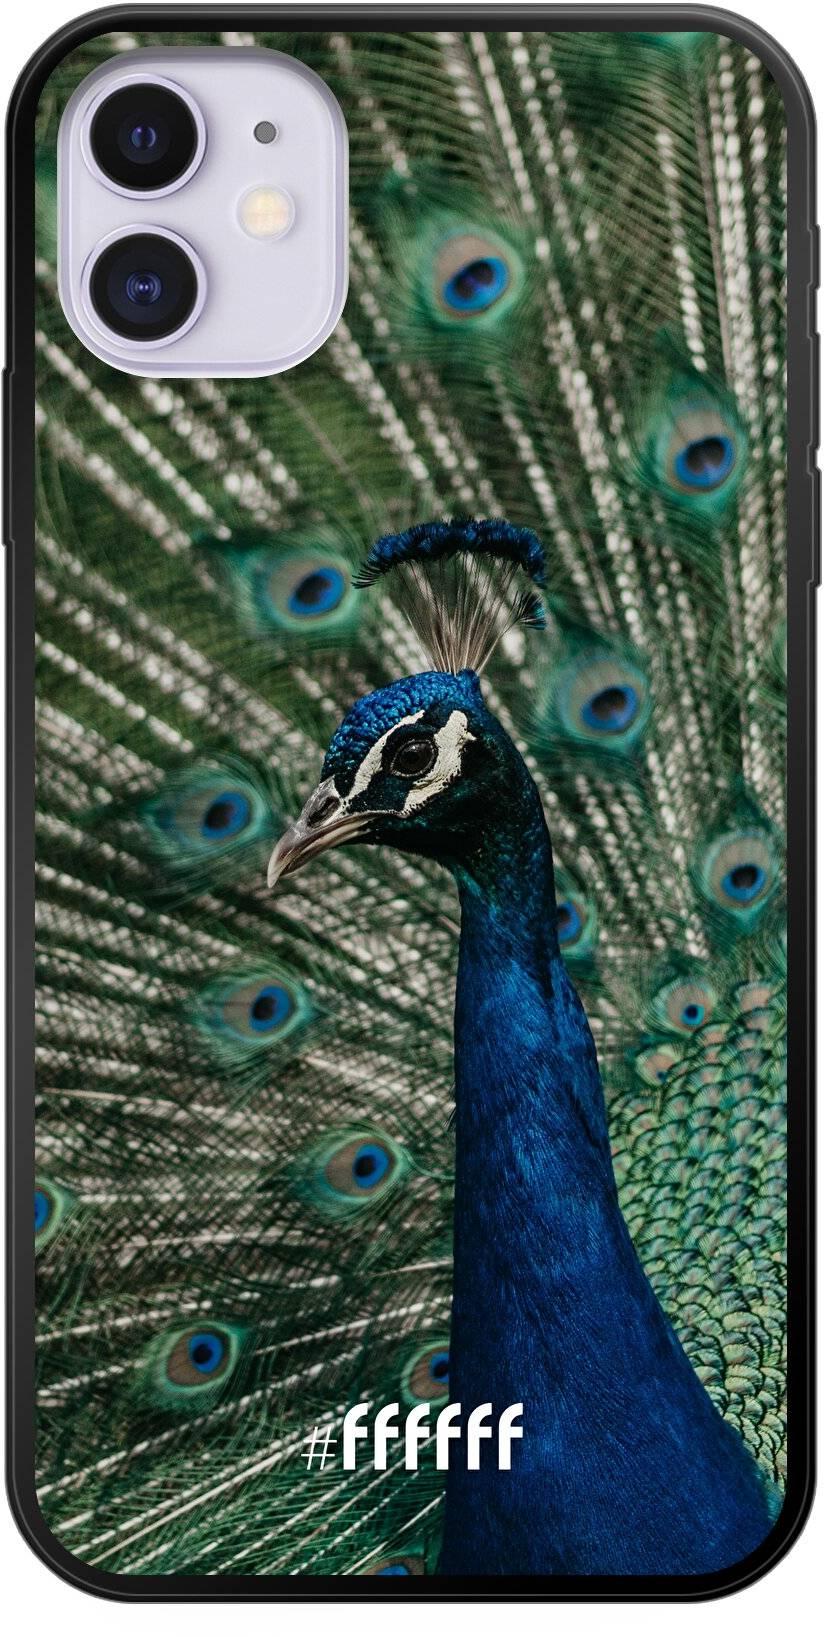 Peacock iPhone 11